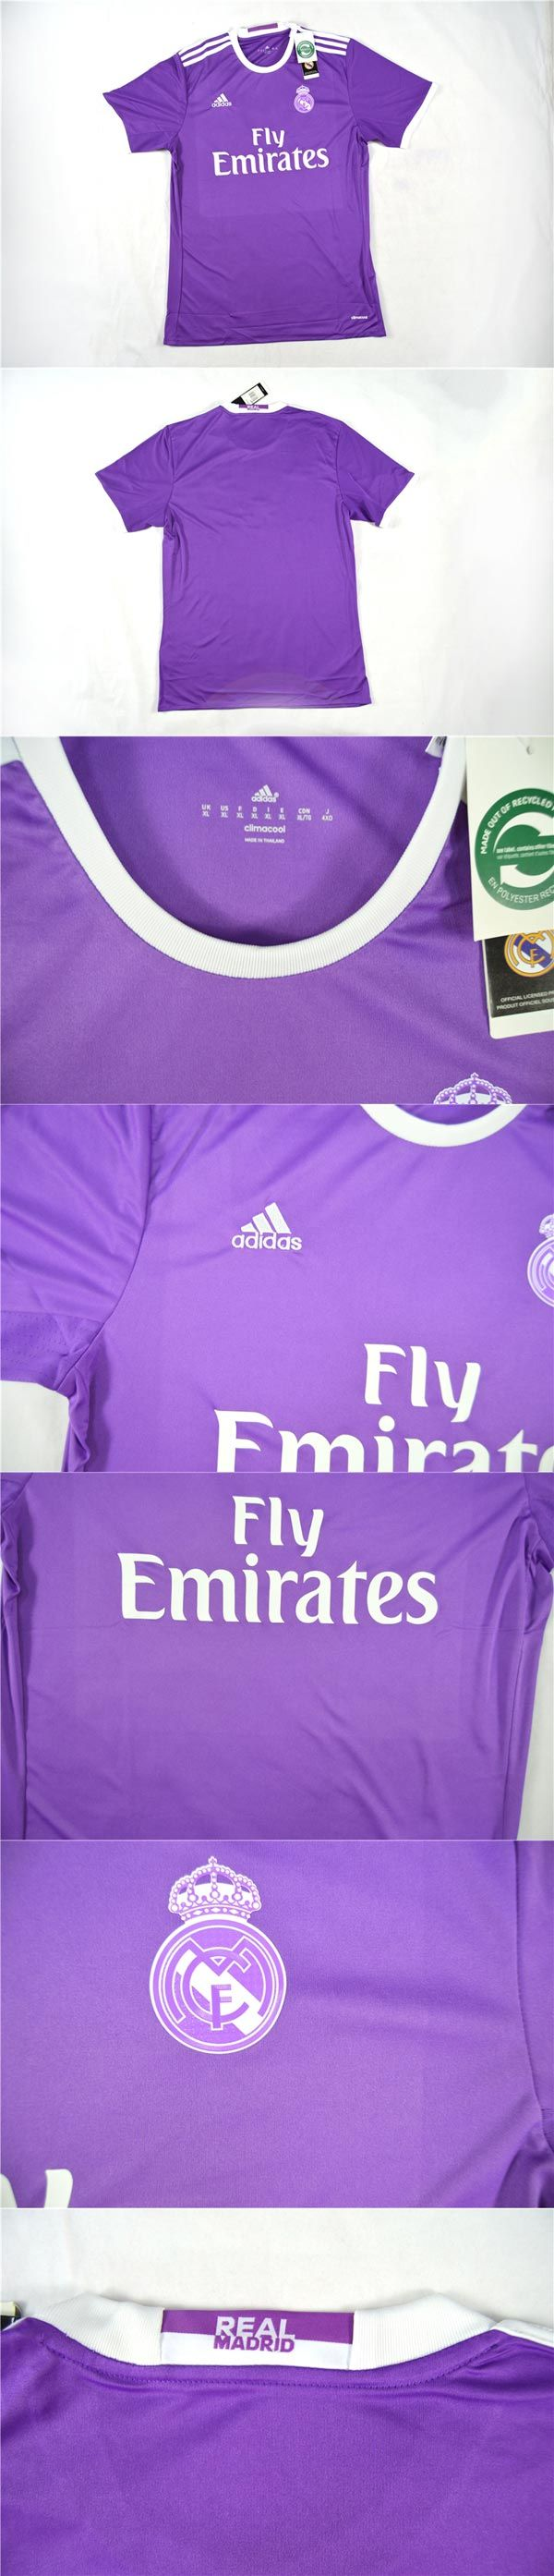 Cheap Soccer Jerseys    Spanish Liga Real Madrid Away Purple Soccer Jersey Shirt 2016-2017   www.hotclubjersey.com